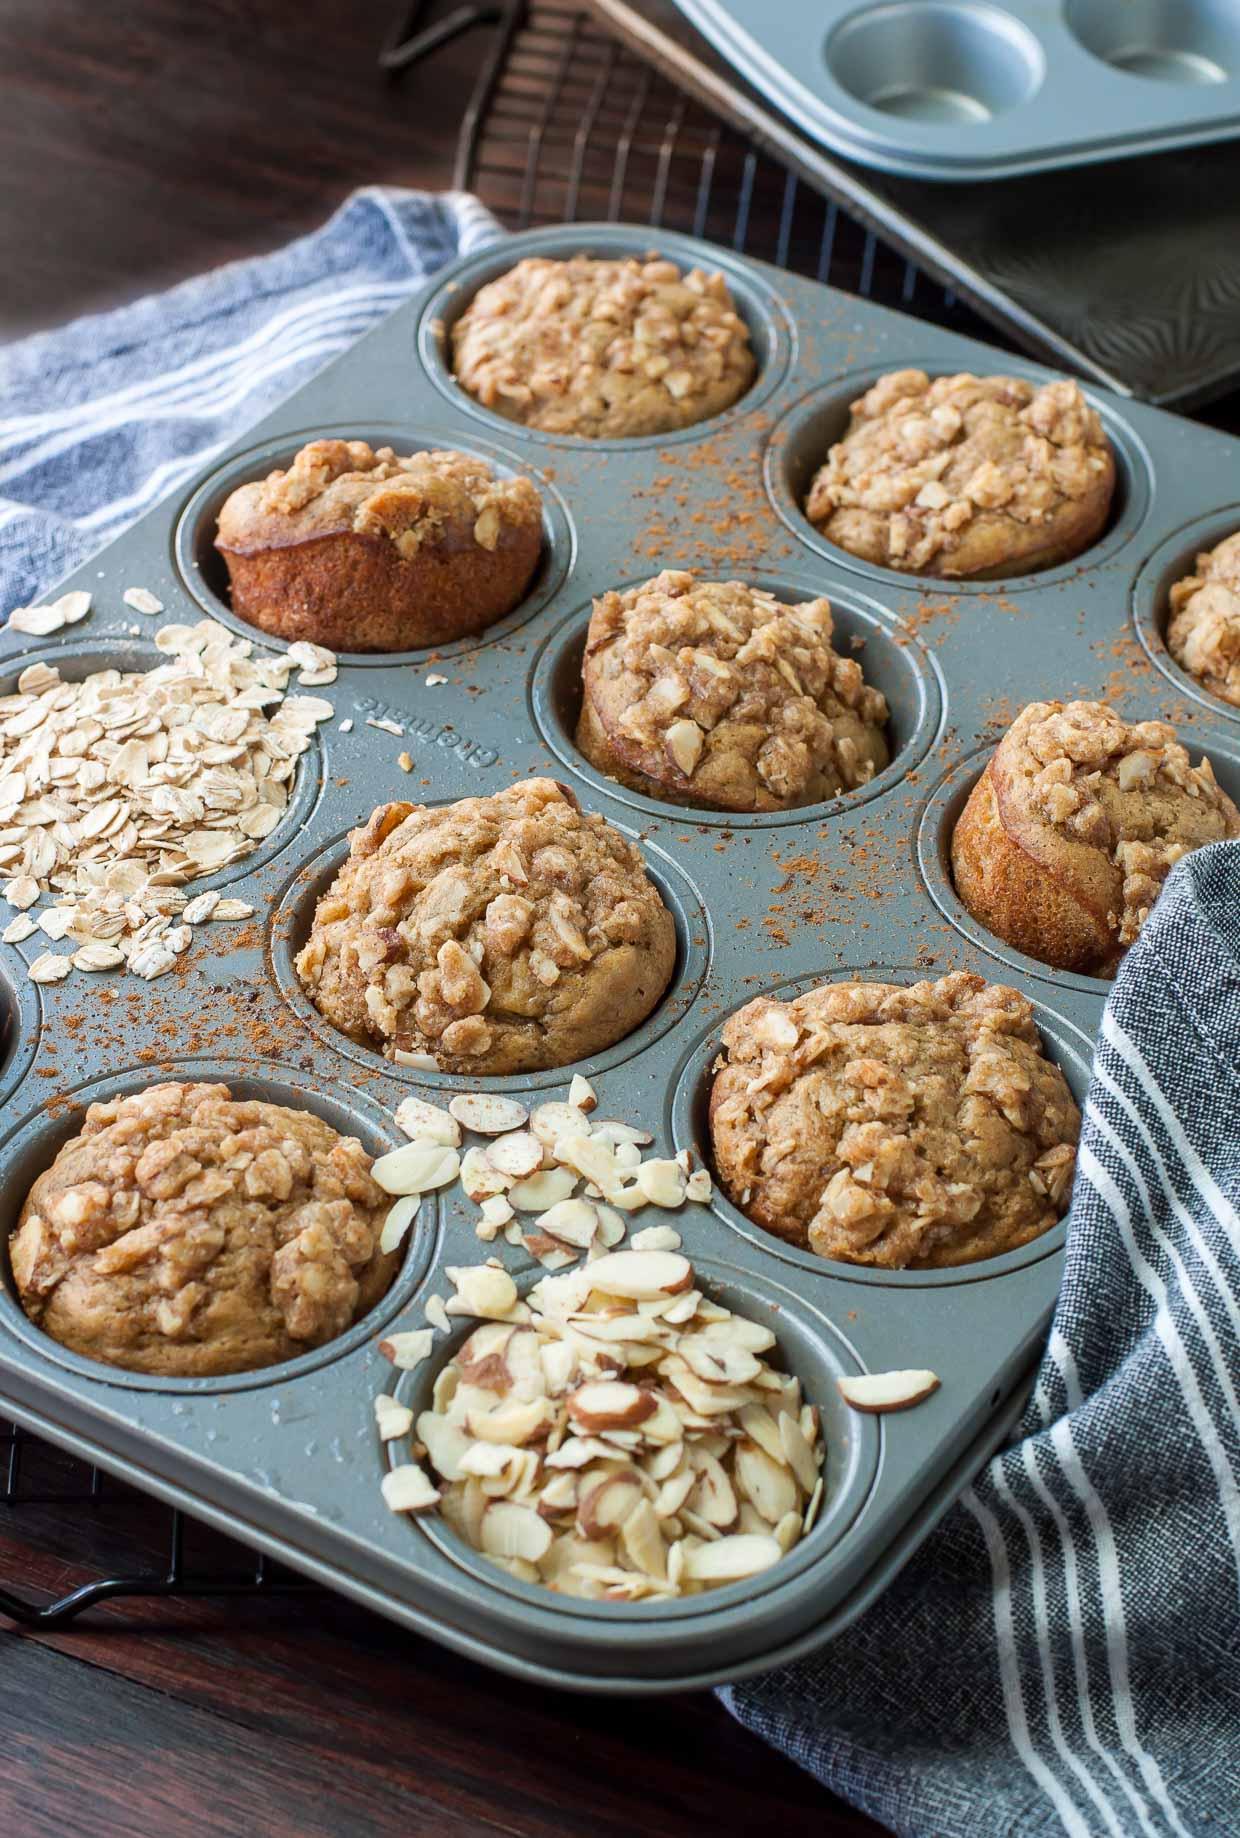 Cinnamon Streusel Banana Almond Muffins